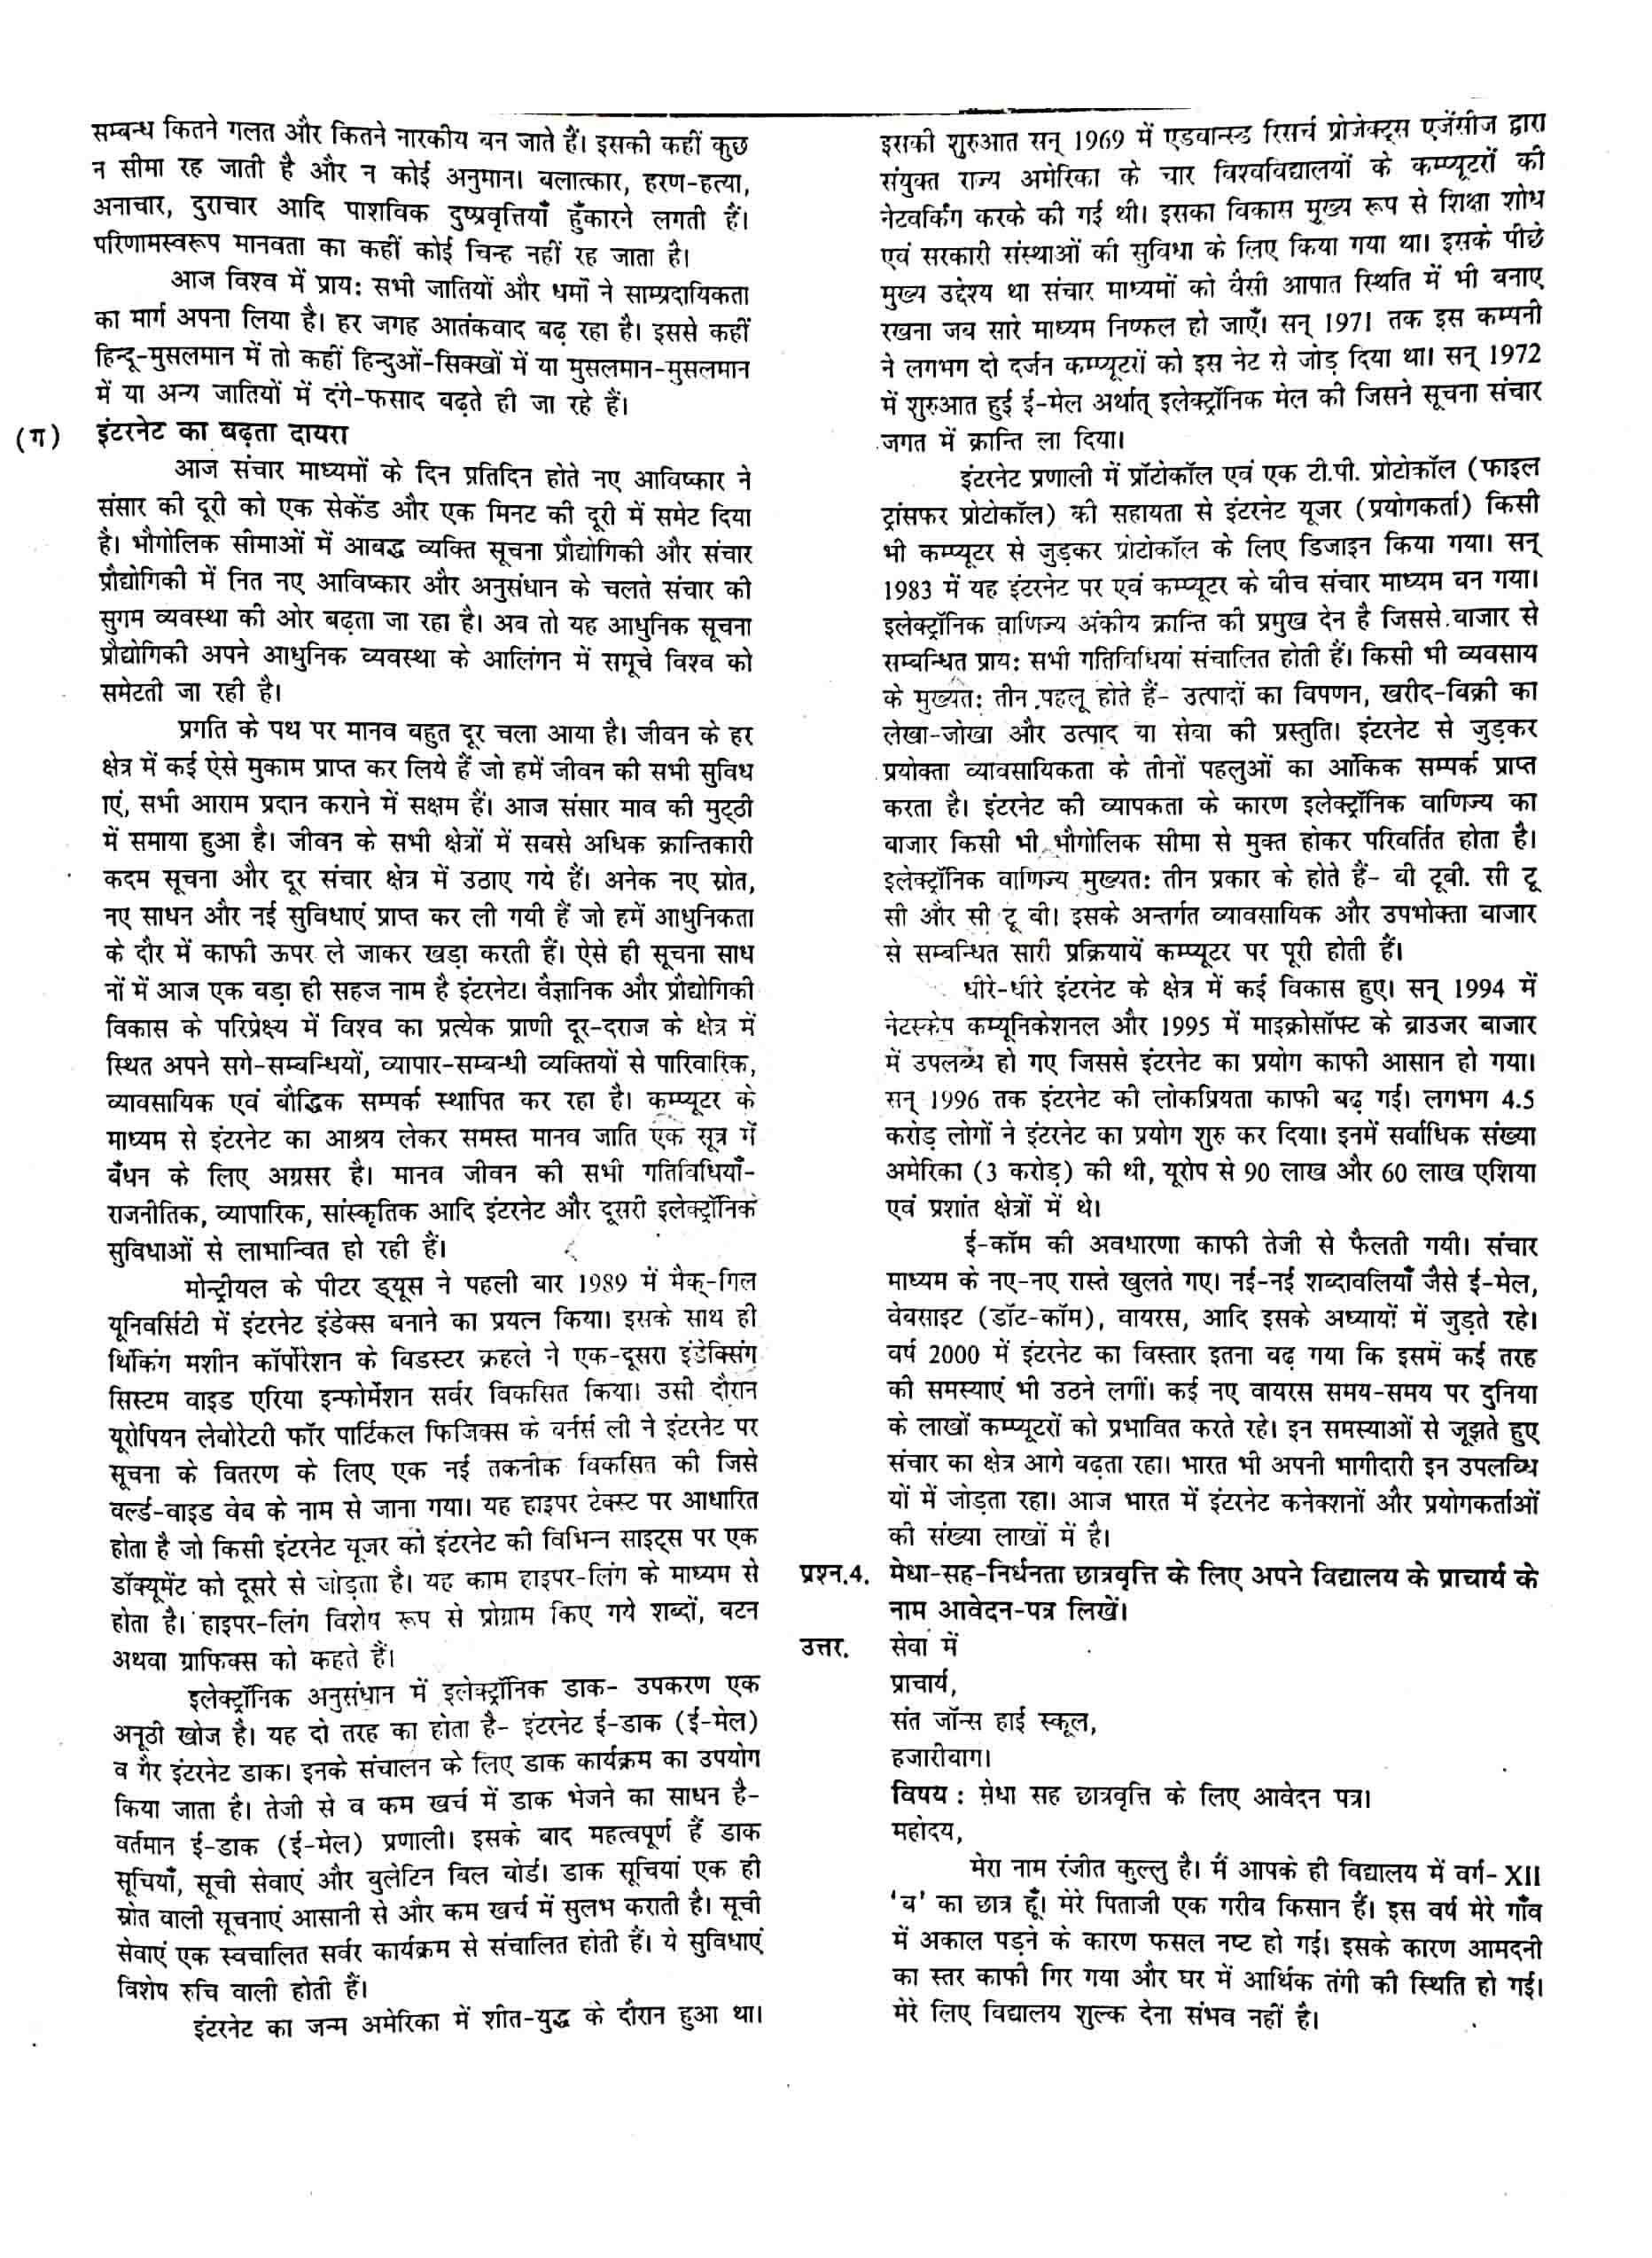 JAC Class 12 hindi 2017 Question Paper 02